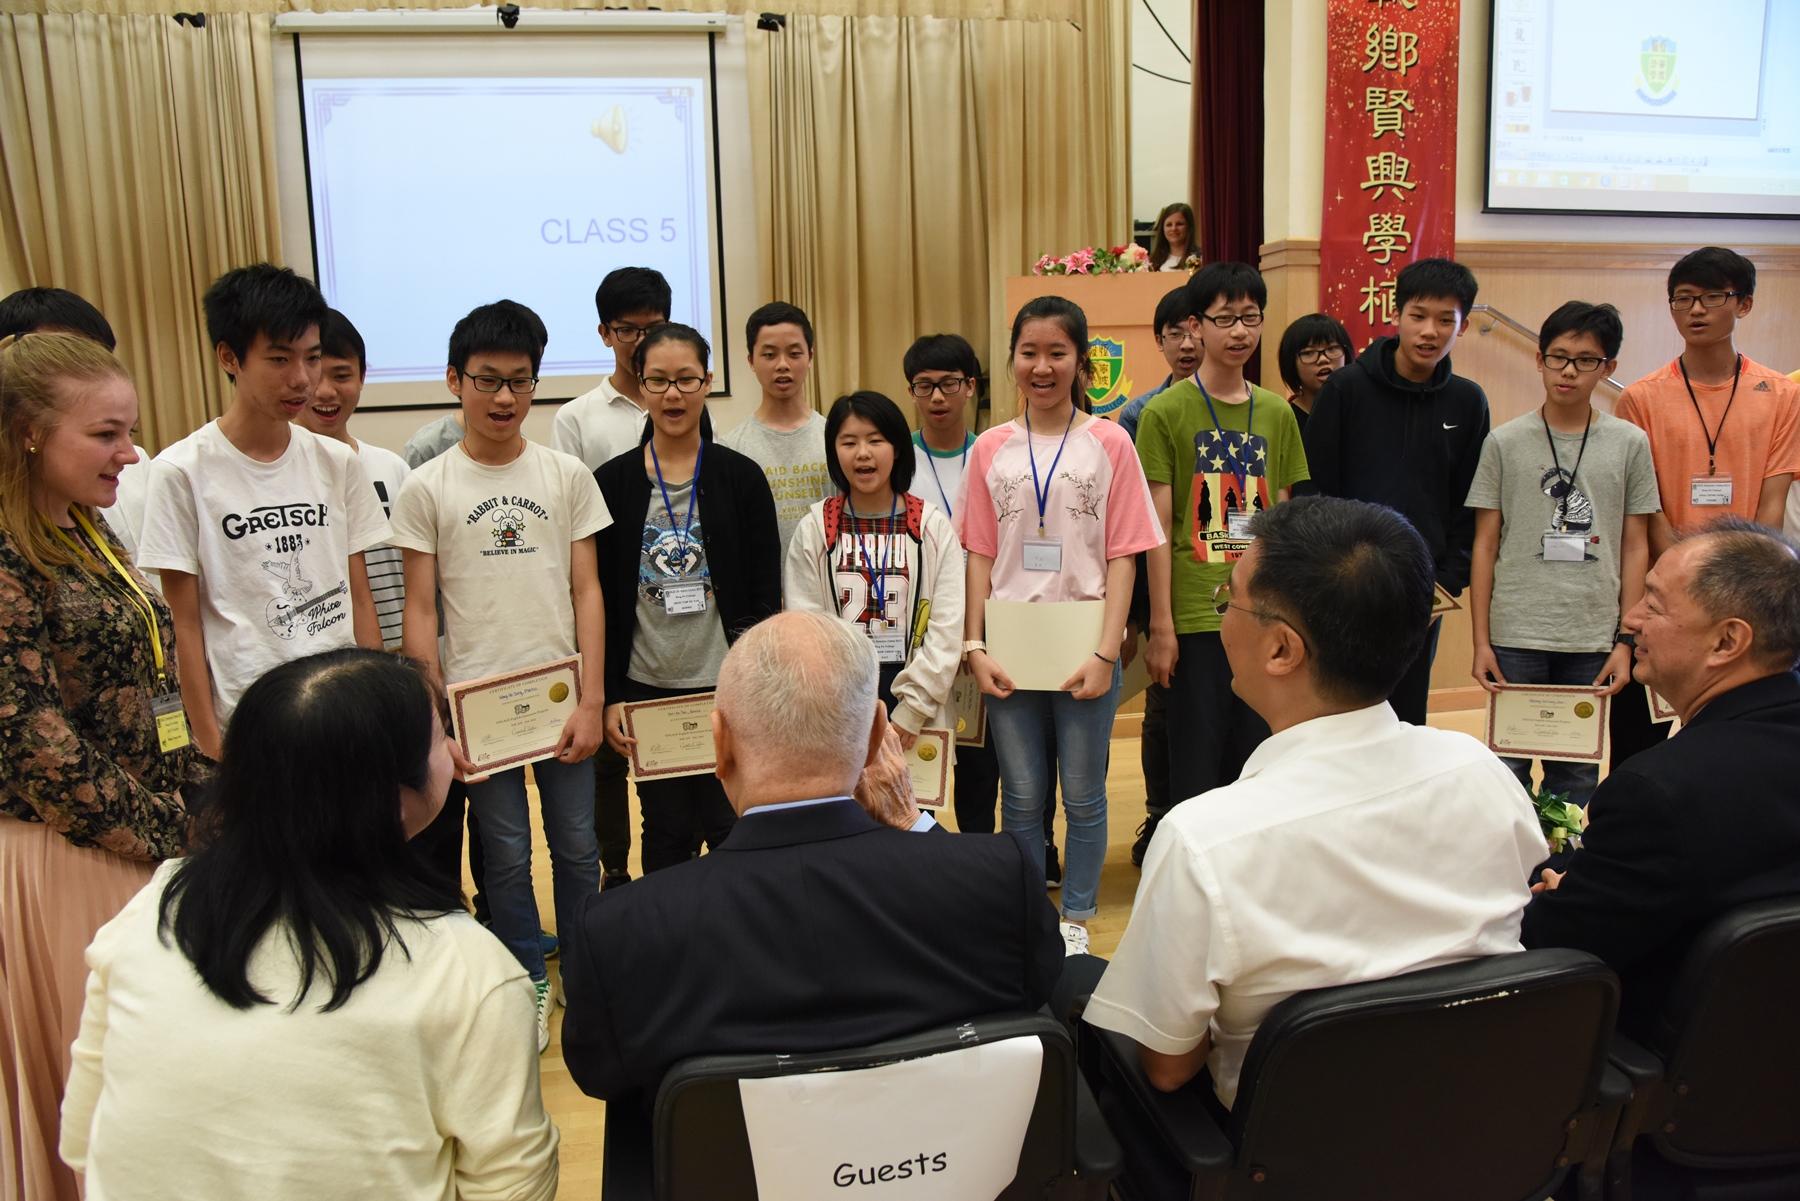 http://www.npc.edu.hk/sites/default/files/dsc_0301.jpg